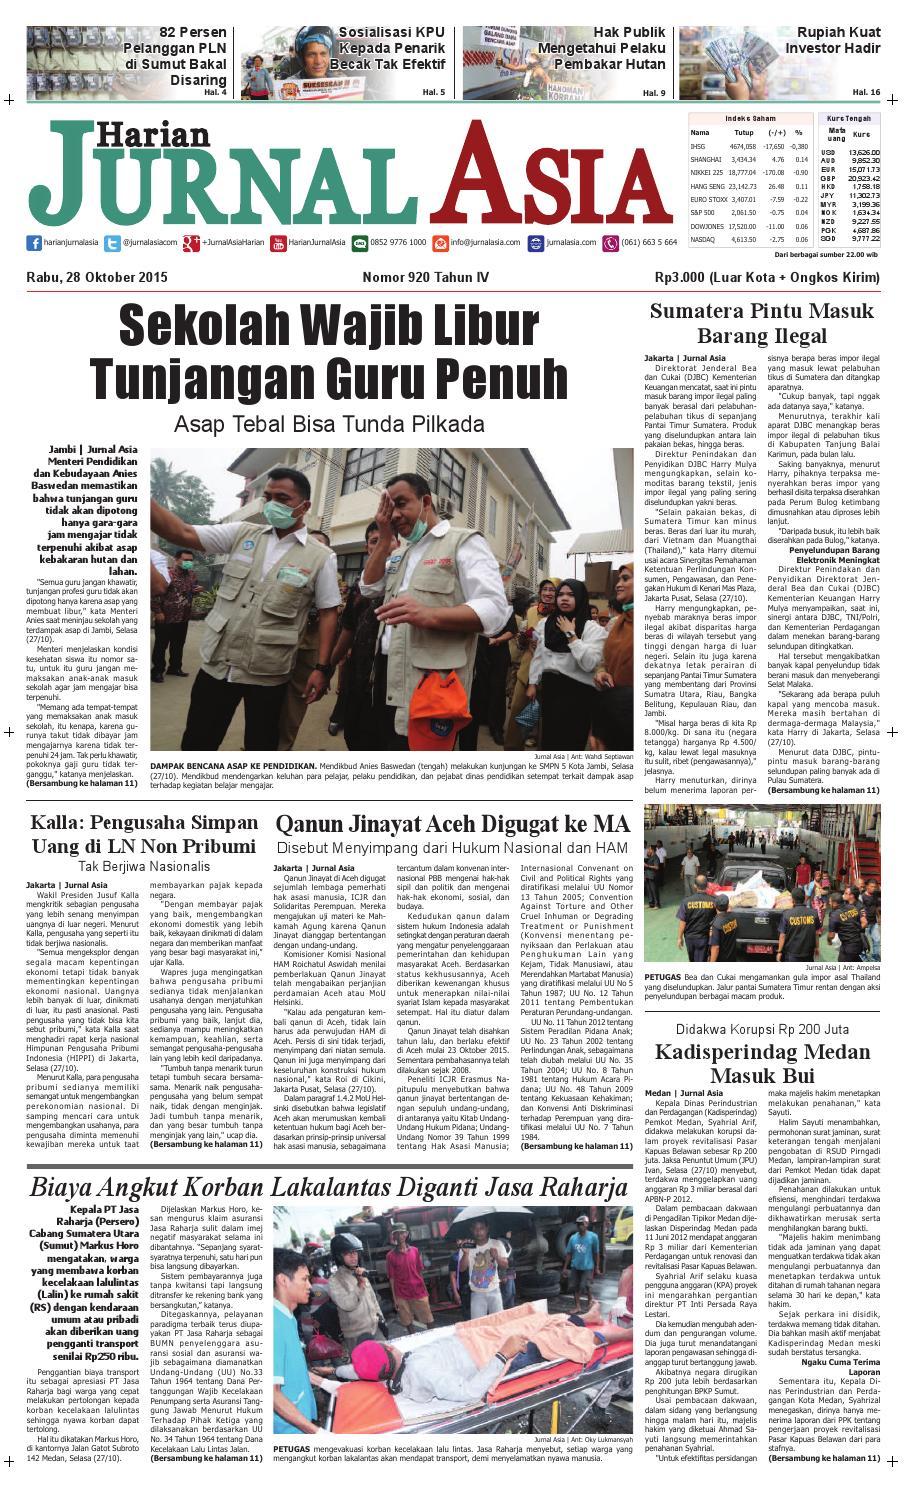 Harian Jurnal Asia Edisi Rabu 28 Oktober 2015 By Perdana Axis Acak Revanyu Medan Issuu